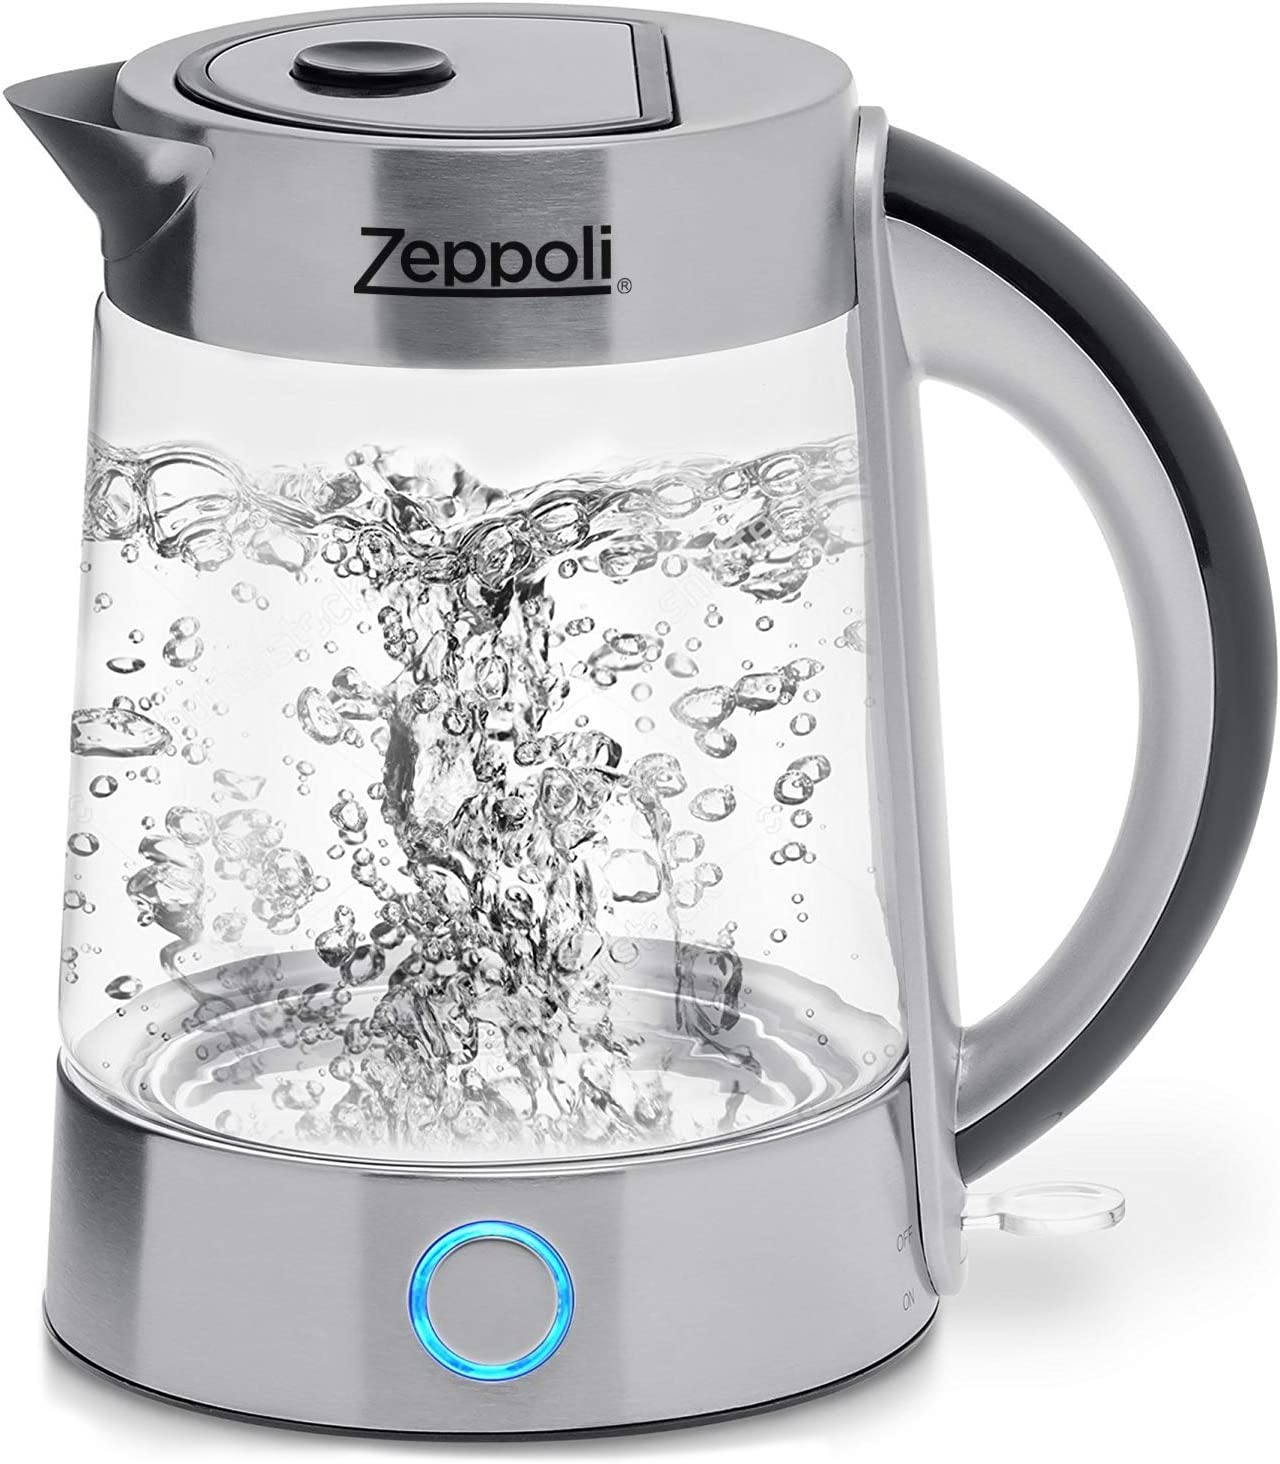 Zeppoli Electric Kettle BPA Free – Fast Boiling Glass Tea Kettle 1.7L Cordless, Stainless Steel Finish Hot Water Kettle Glass Tea Kettle, Tea Pot Hot Water Heater Dispenser